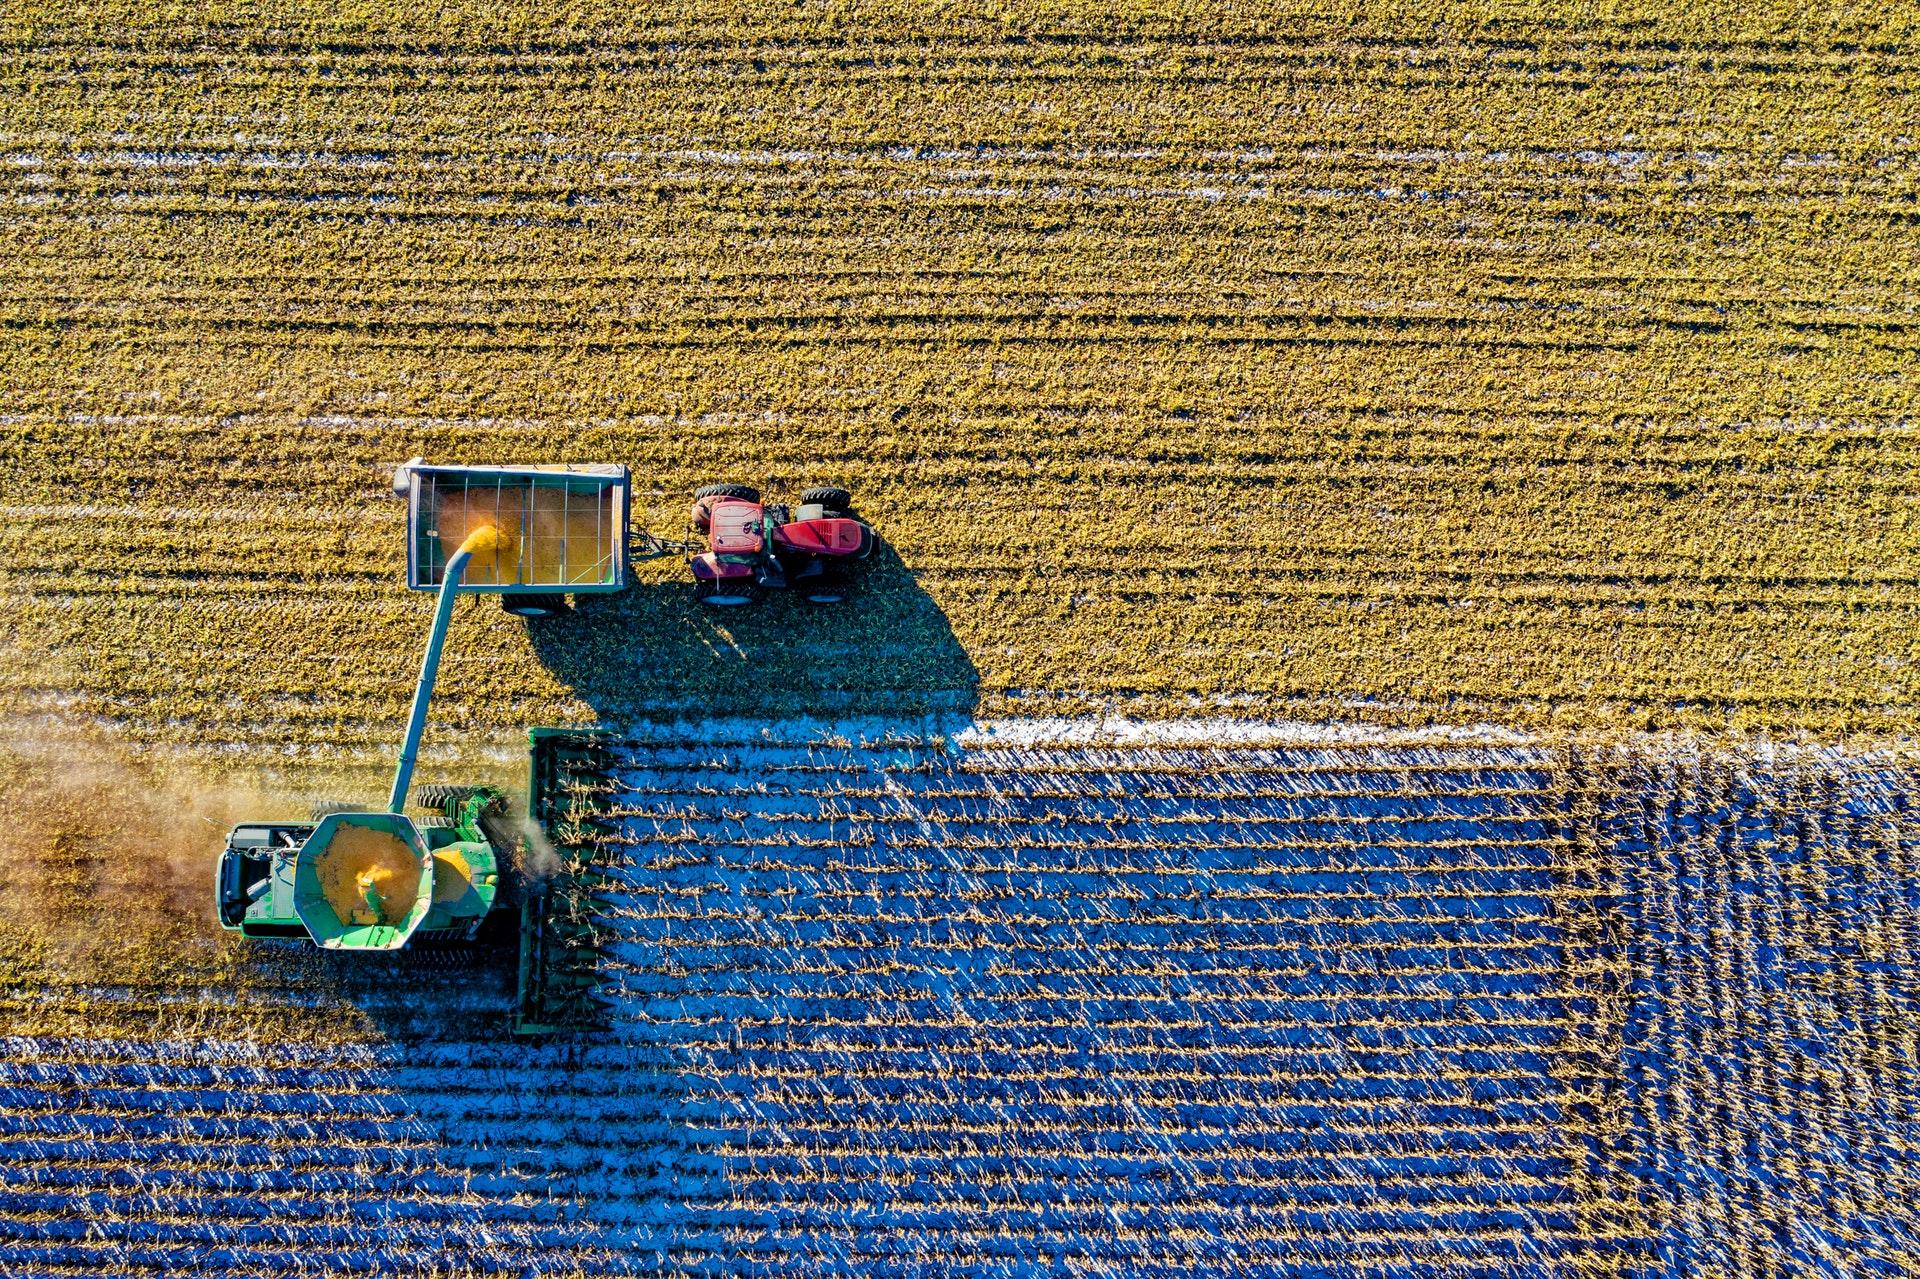 Facroty Farming aerial shot